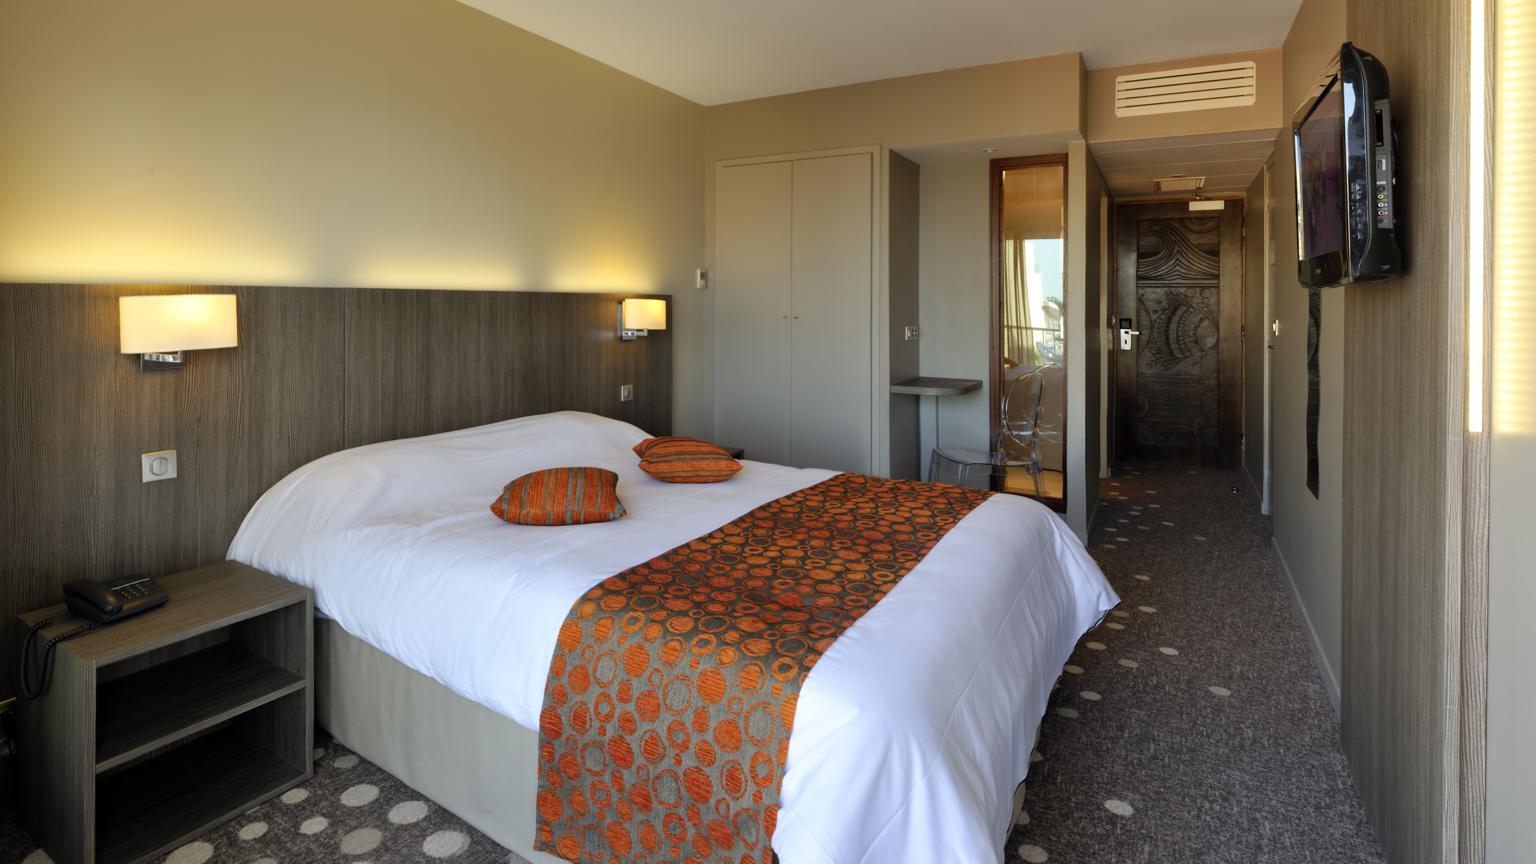 Chambre INTER-HOTEL Arcachon Le Nautic à ARCACHON